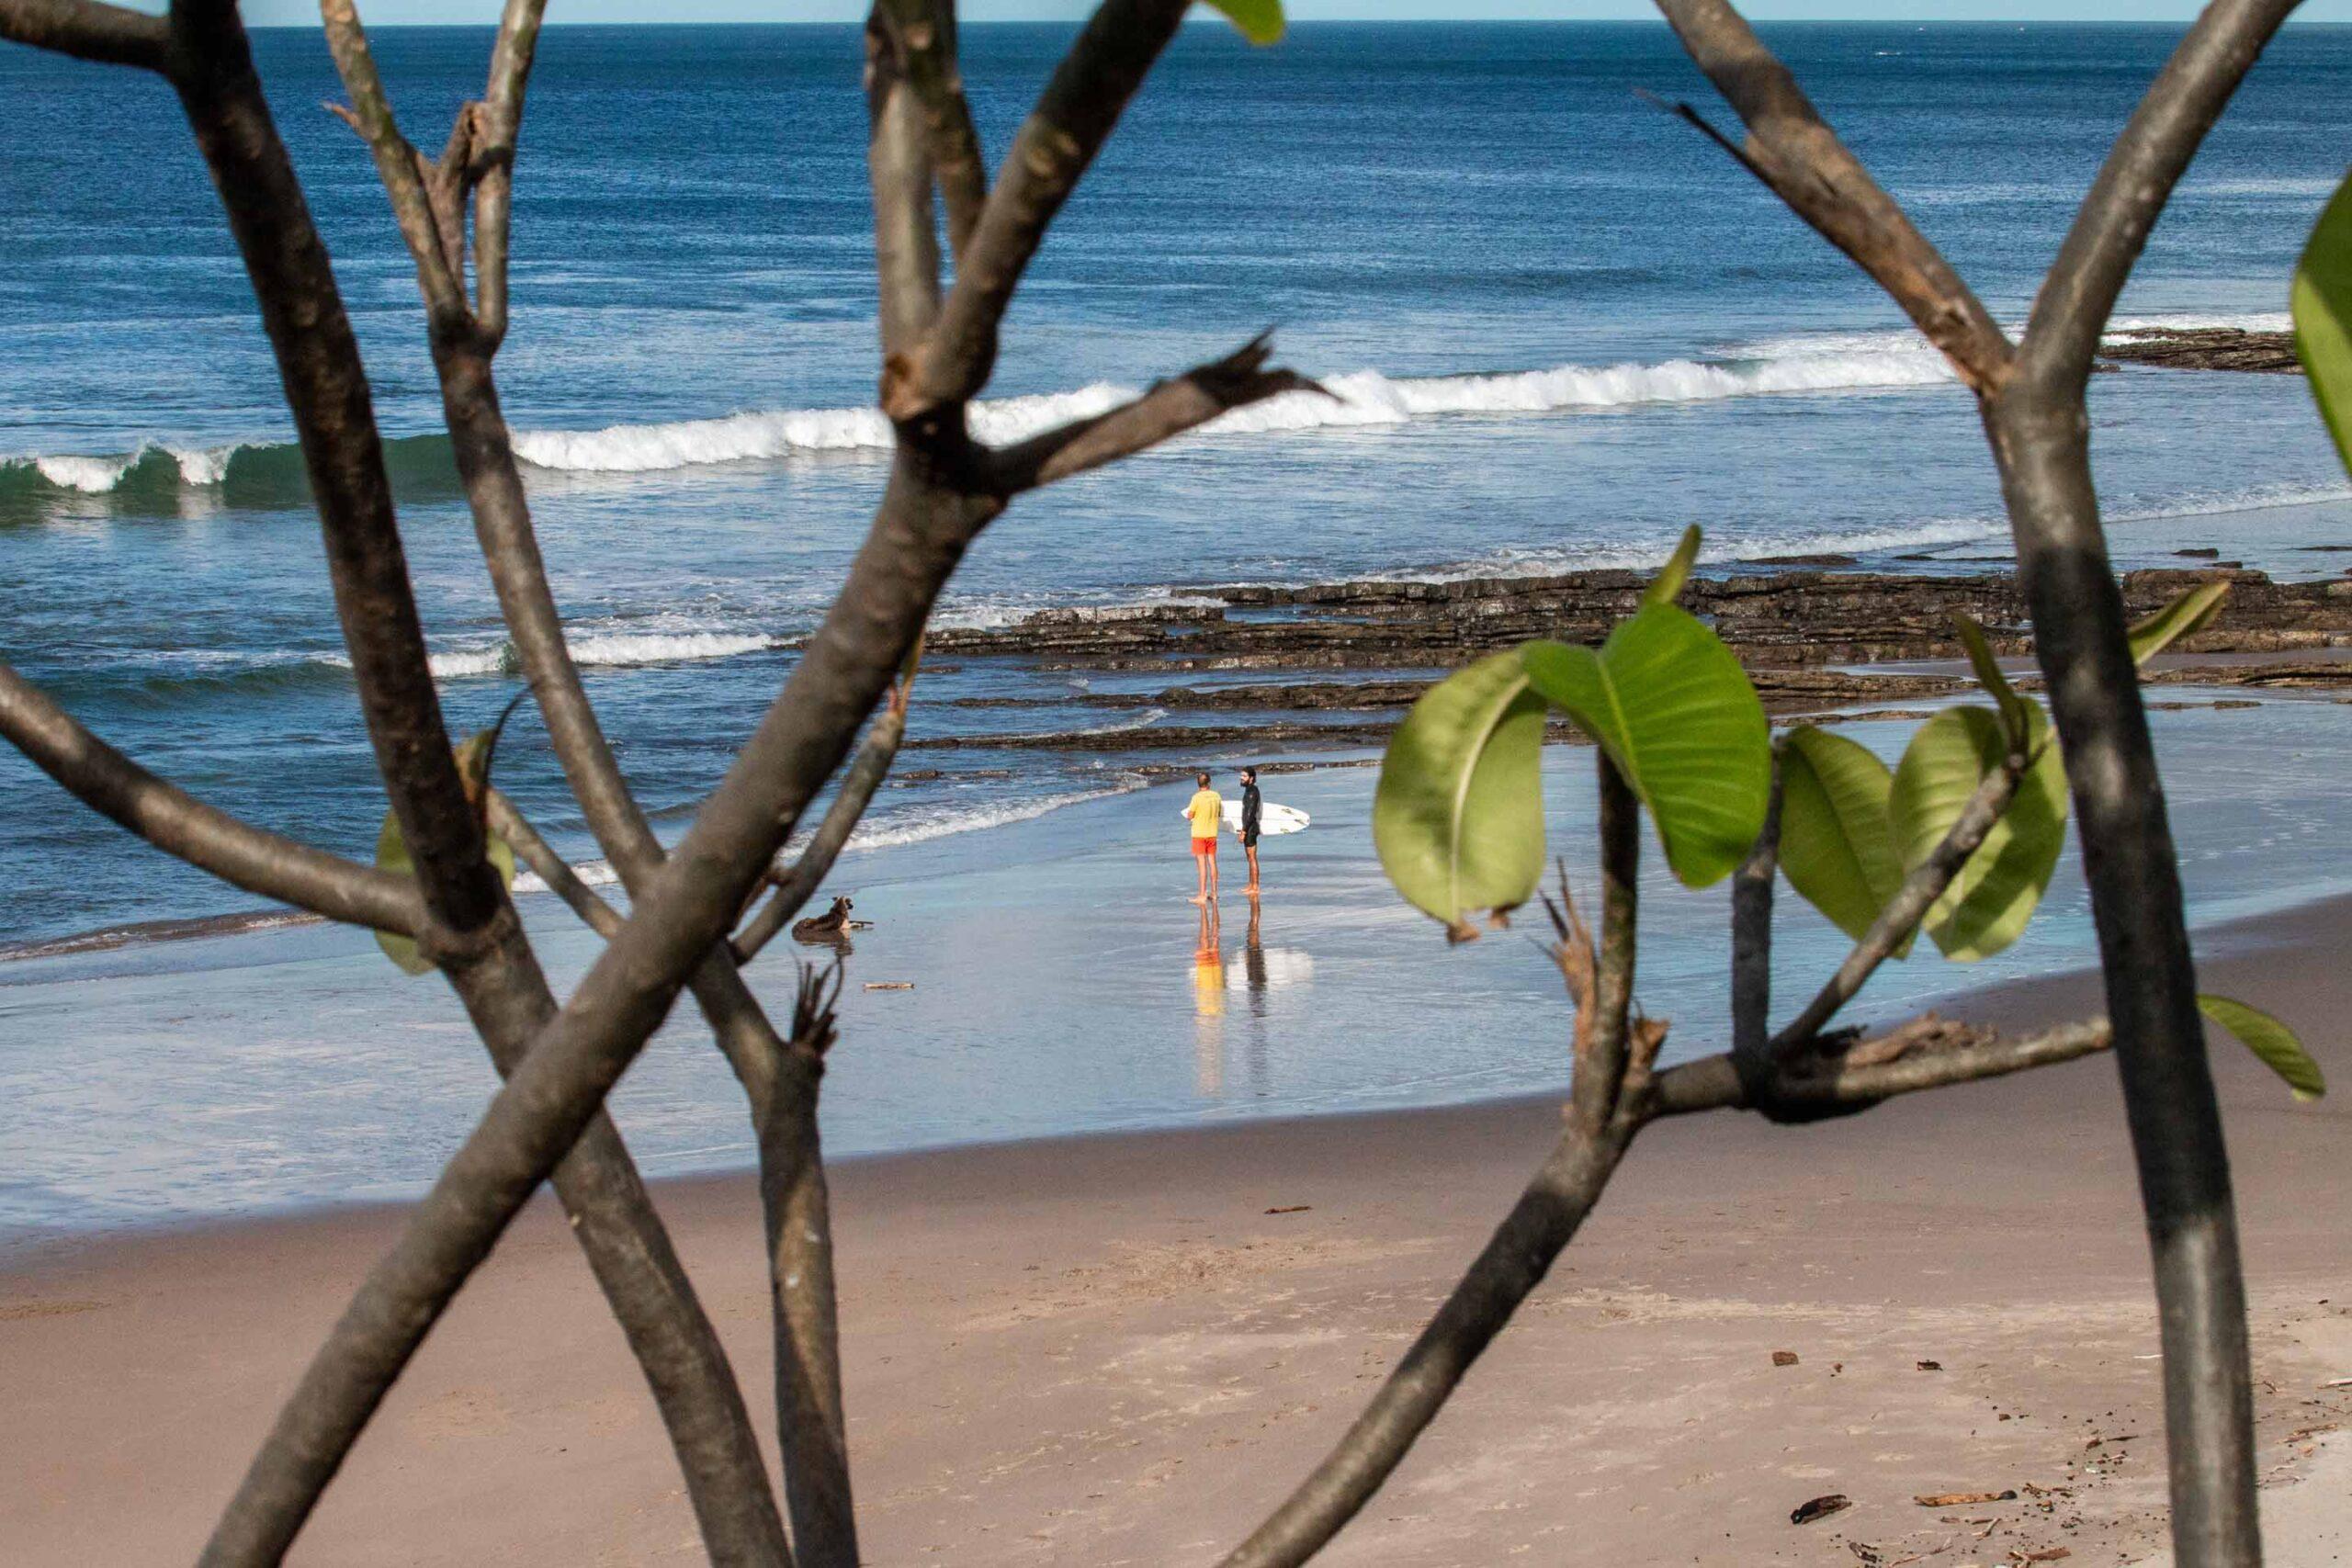 Surfers at Popoyo beach Nicaragua